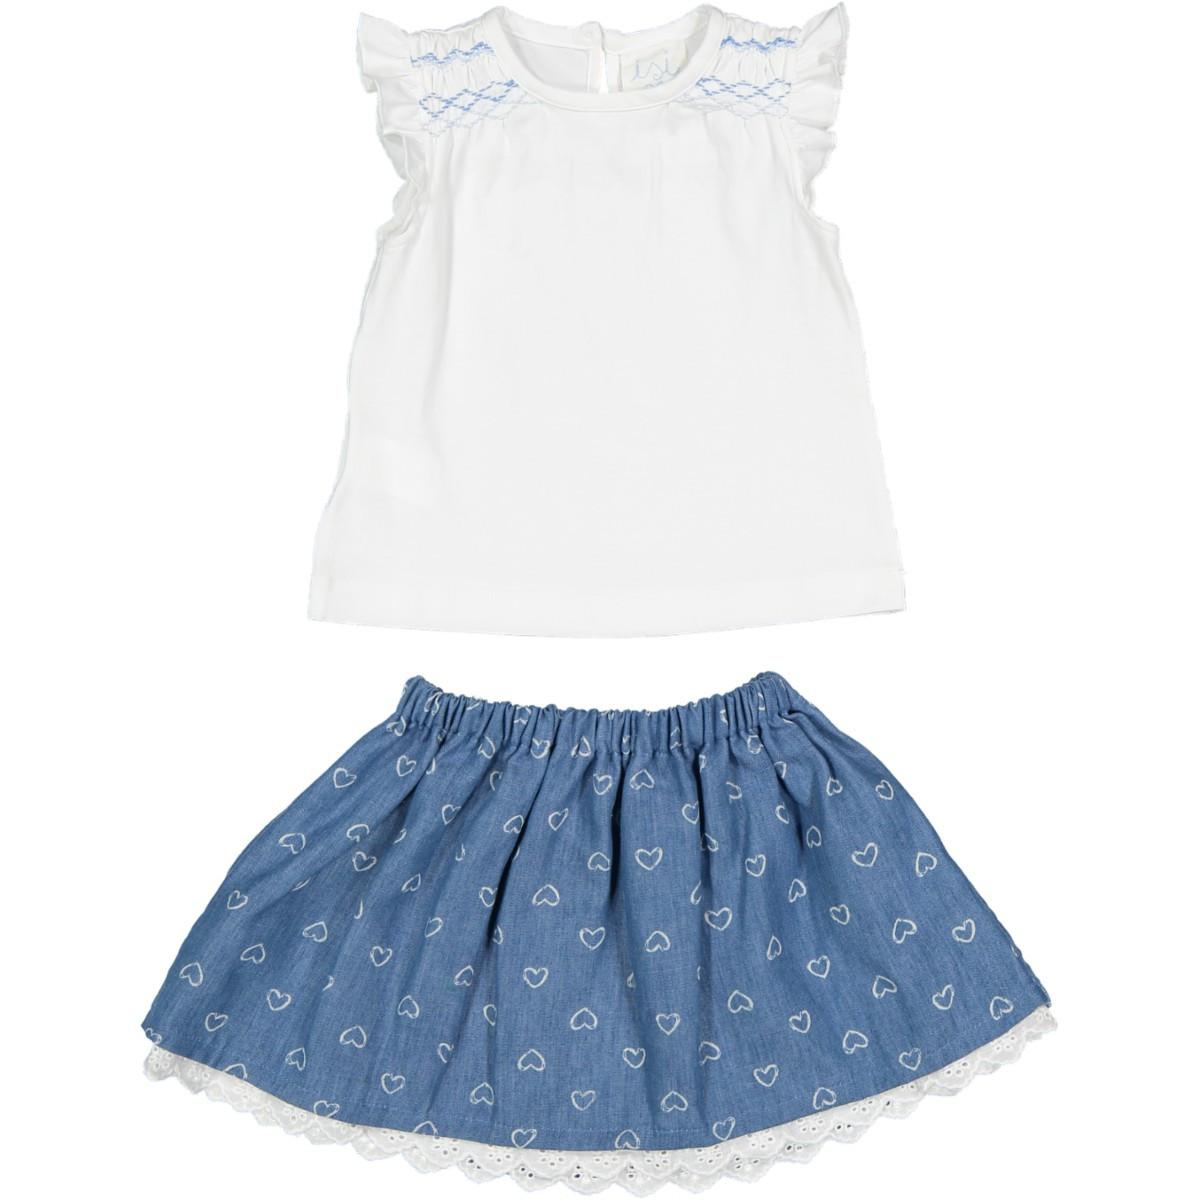 Cuori Denim Shirt A In Bianco Smock CelesteGonna T Con Jersey n0ONwmv8